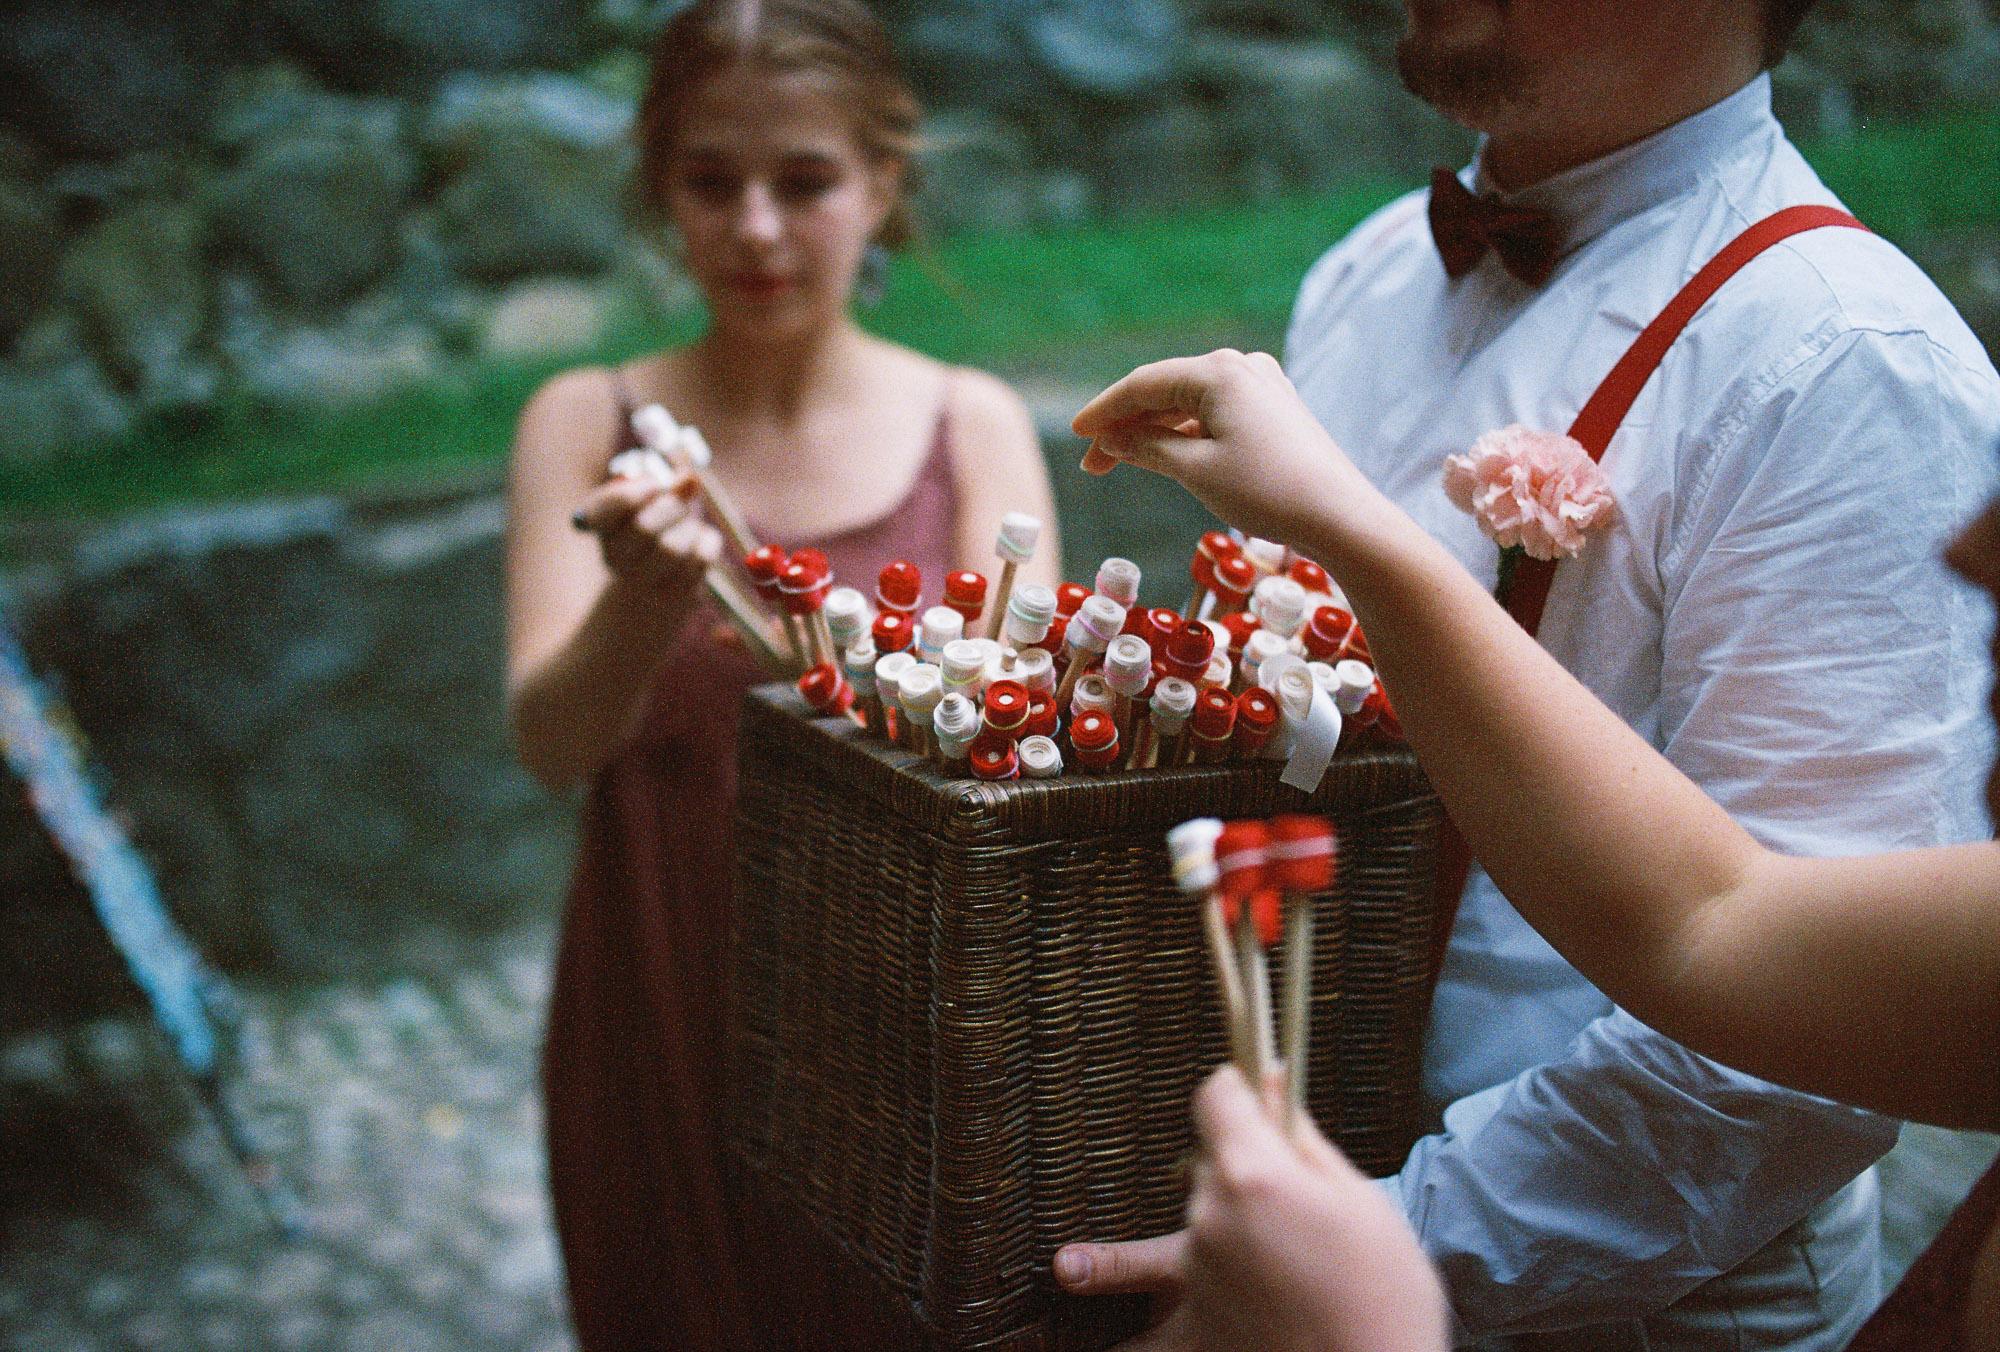 jere-satamo-analog-film-wedding-photographer-finland-251.jpg